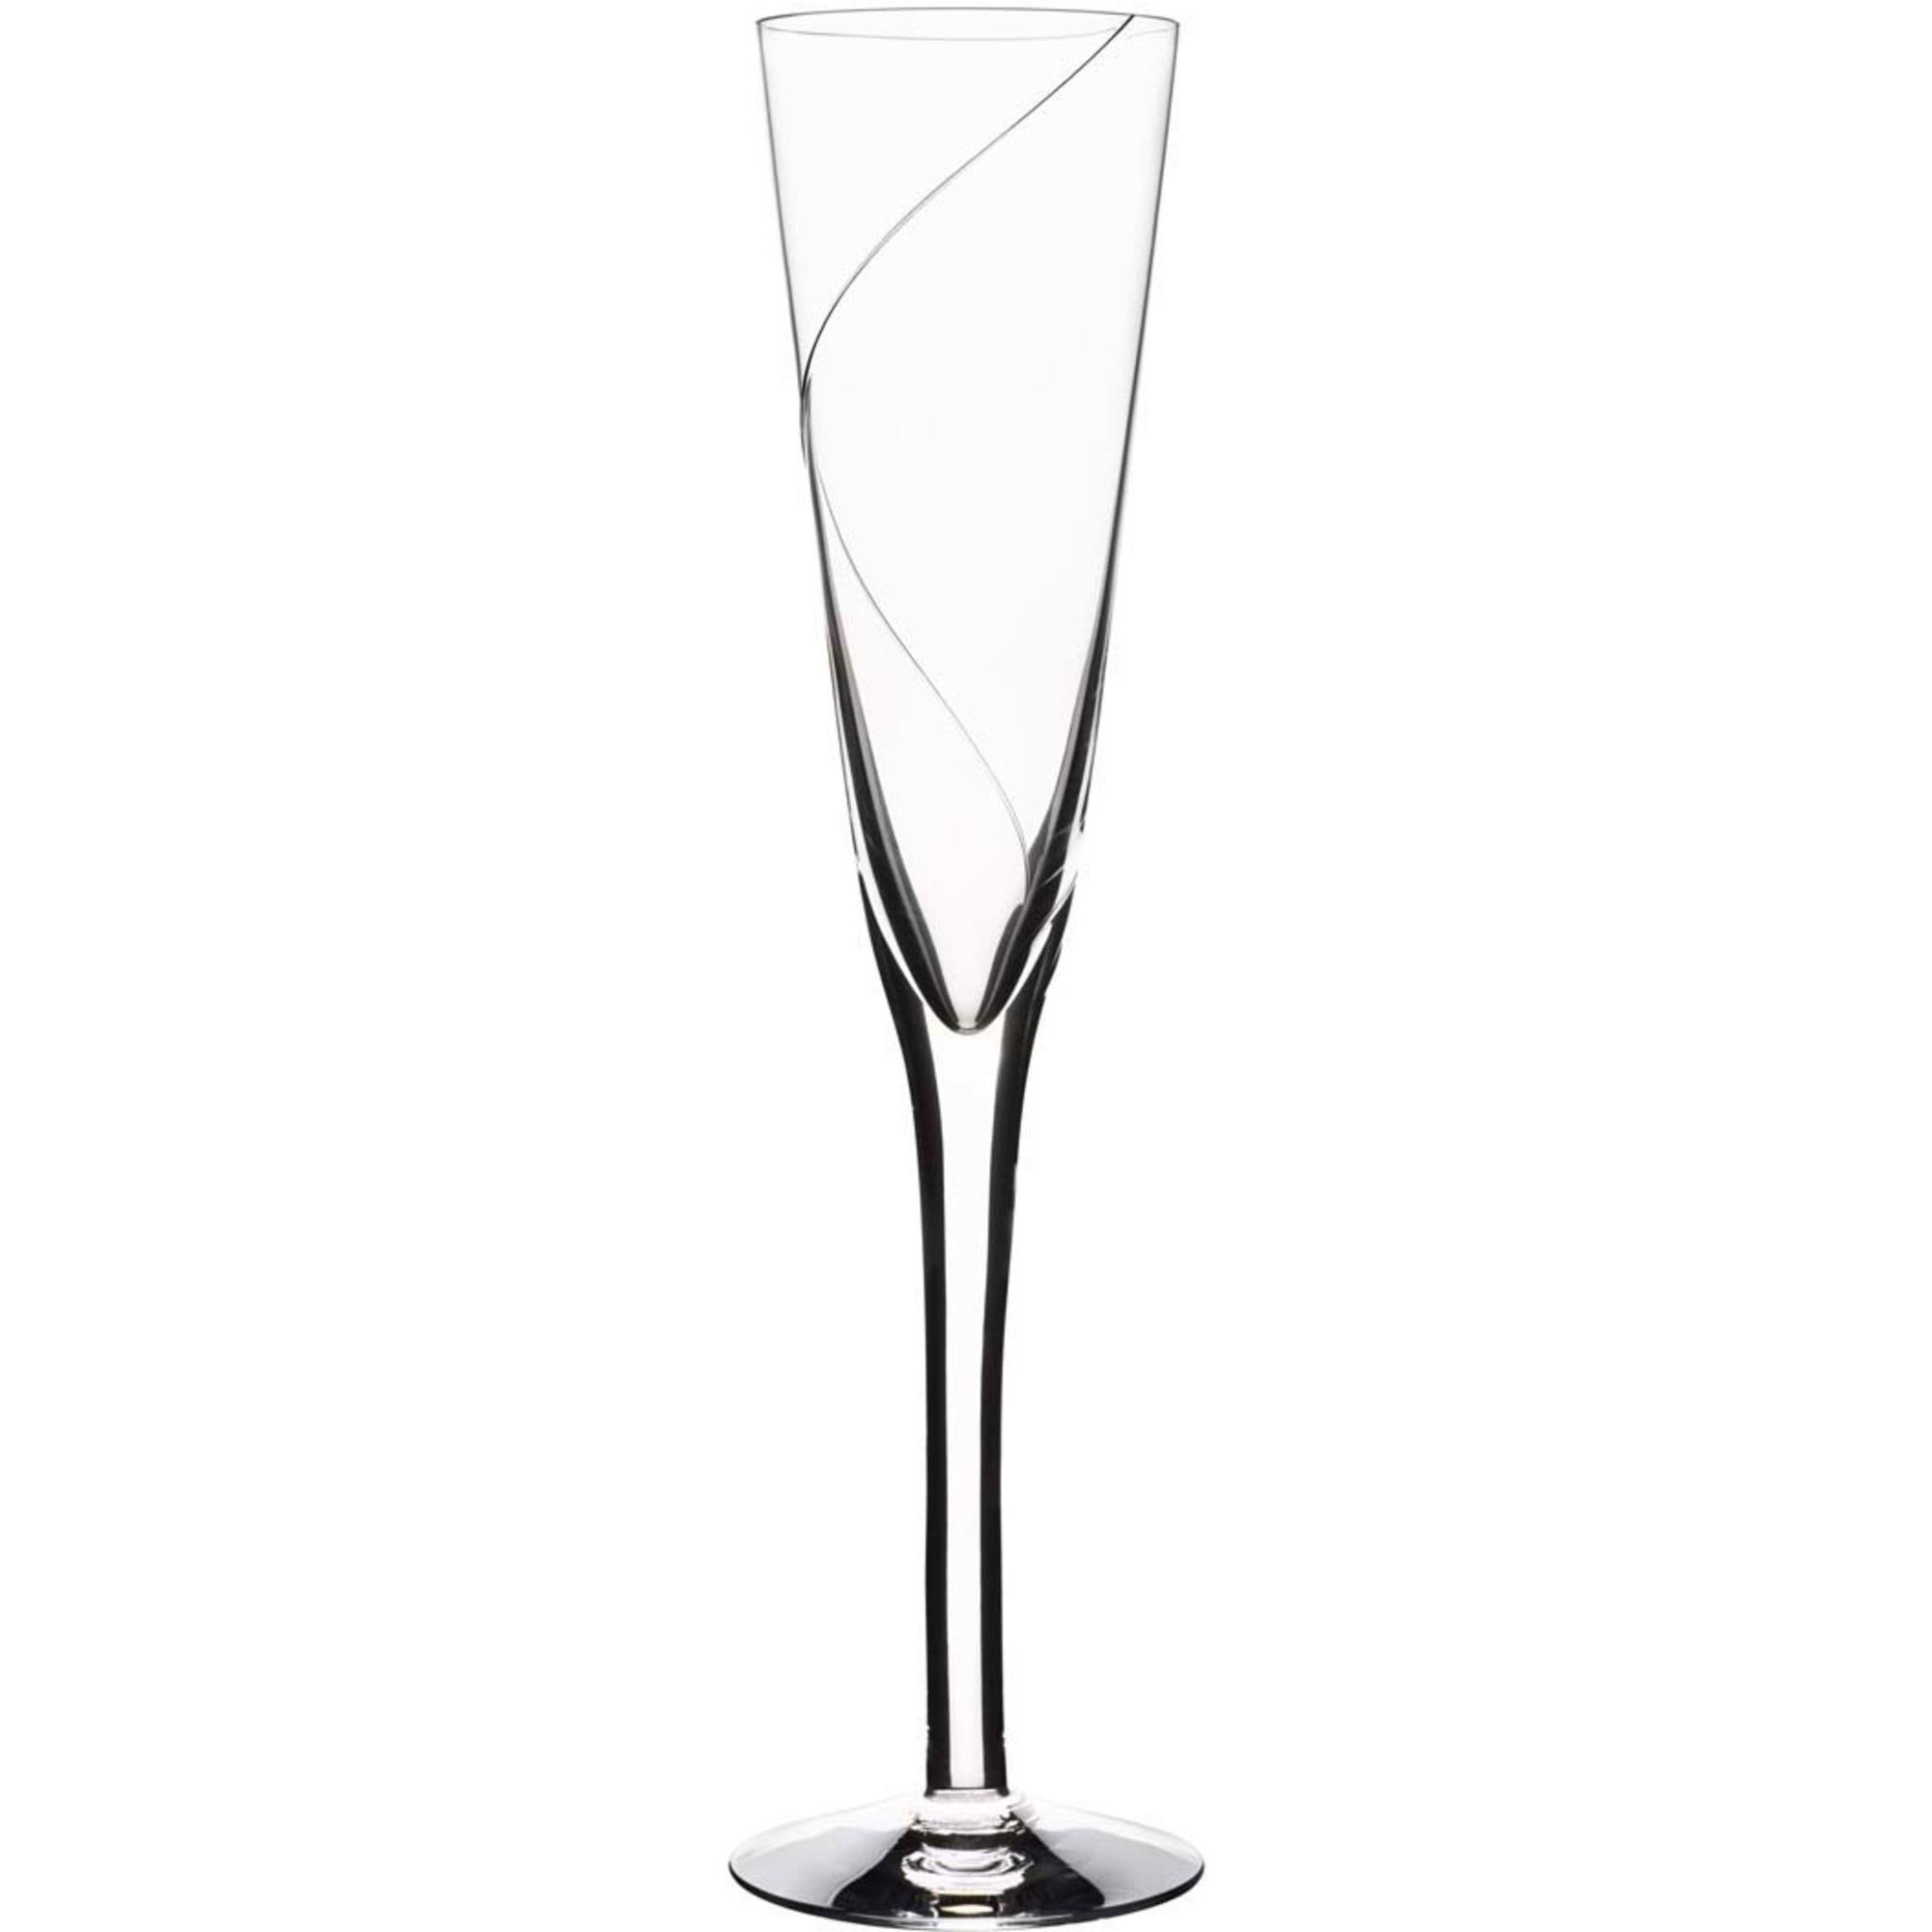 Kosta Boda Line Champagneglas 15 cl